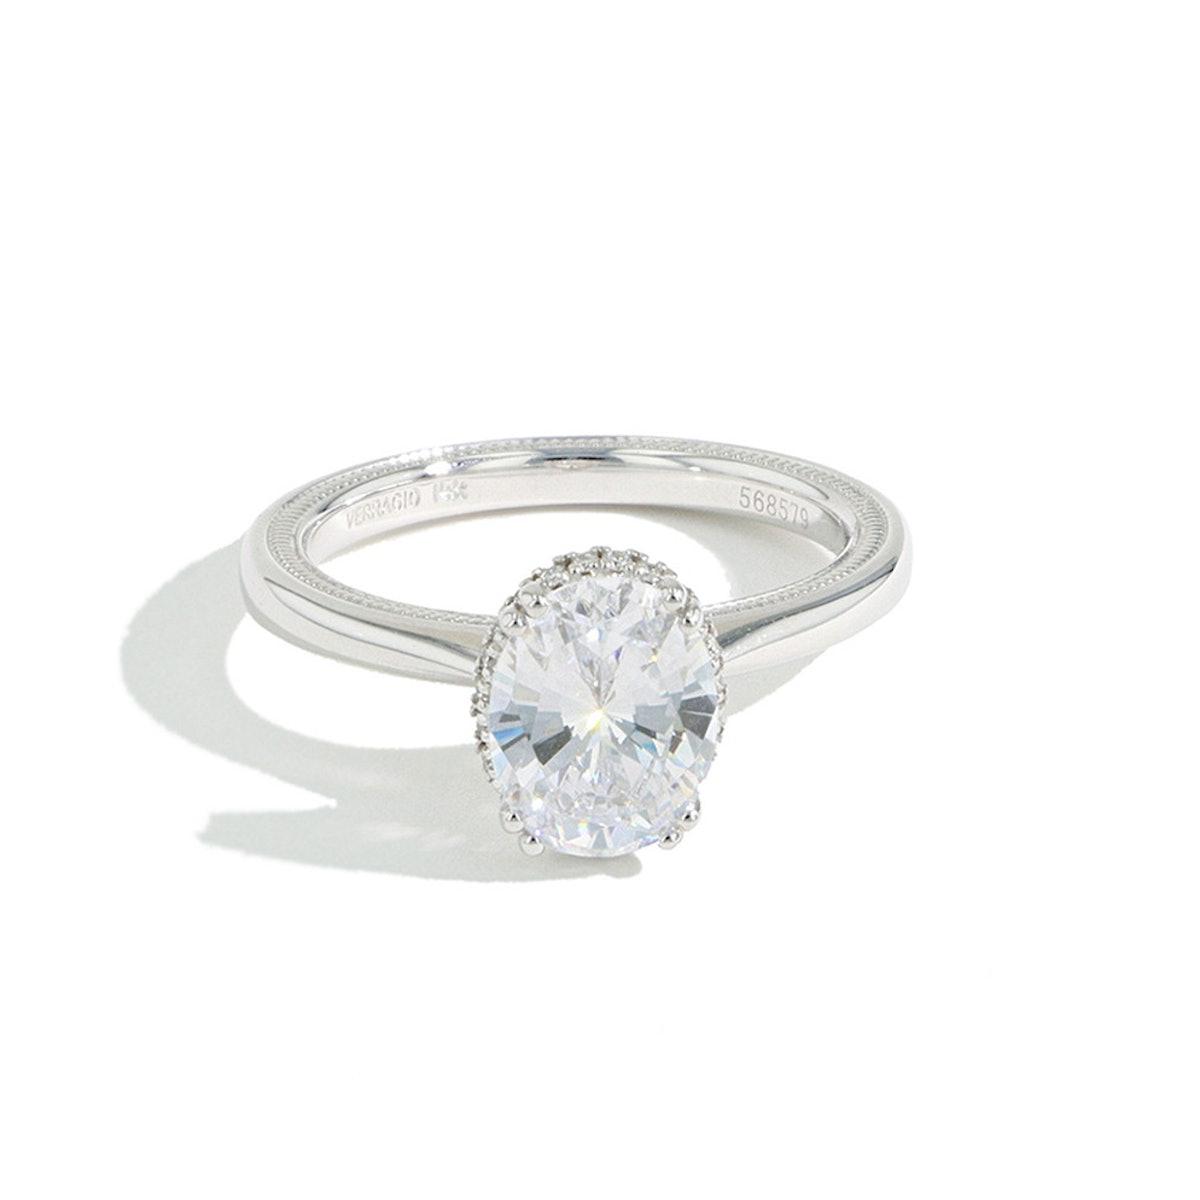 J.R.DUNN's oval diamond hidden halo engagement ring.